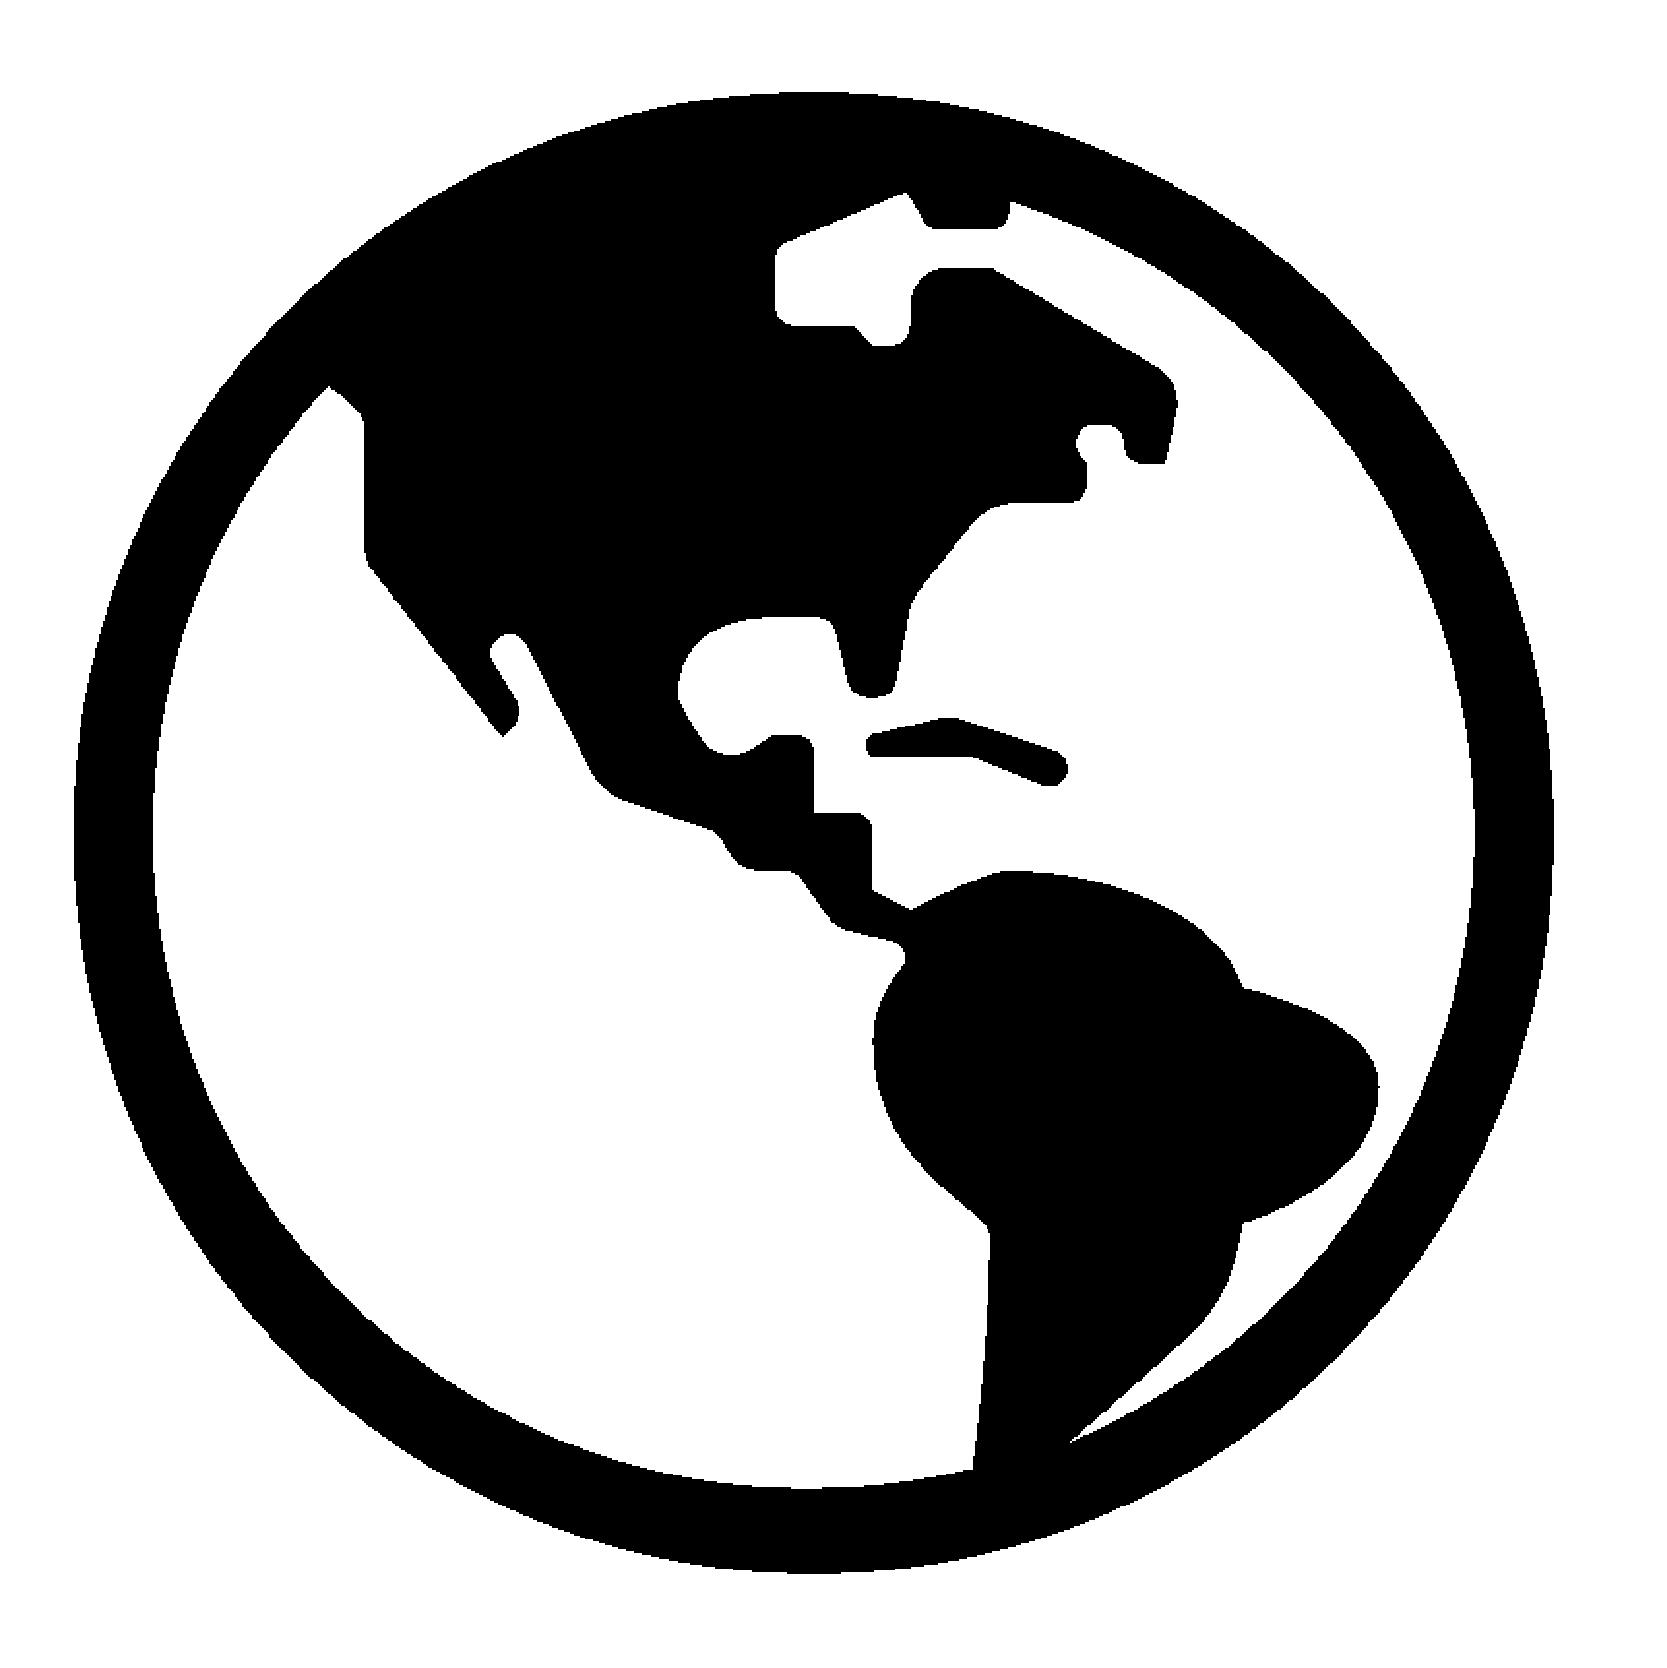 icons_hubspot-08